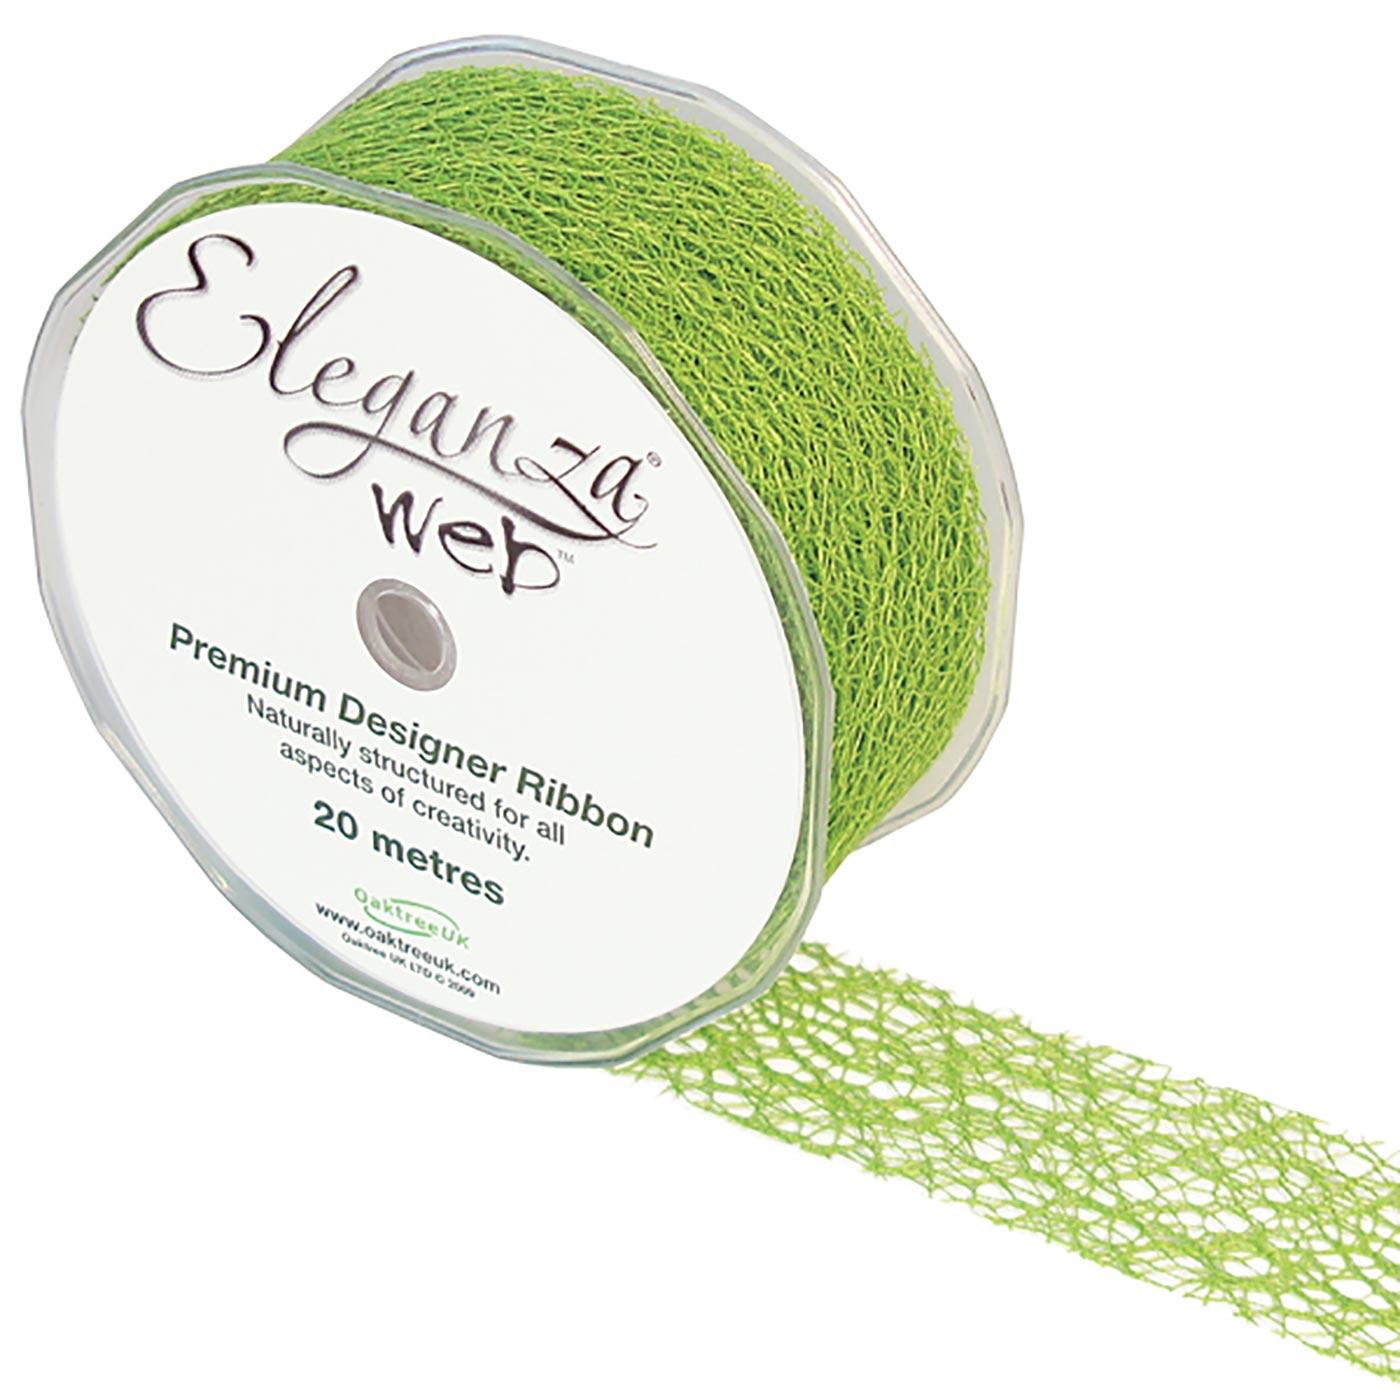 Eleganza Web Ribbon 38mm x 20m Lime Green